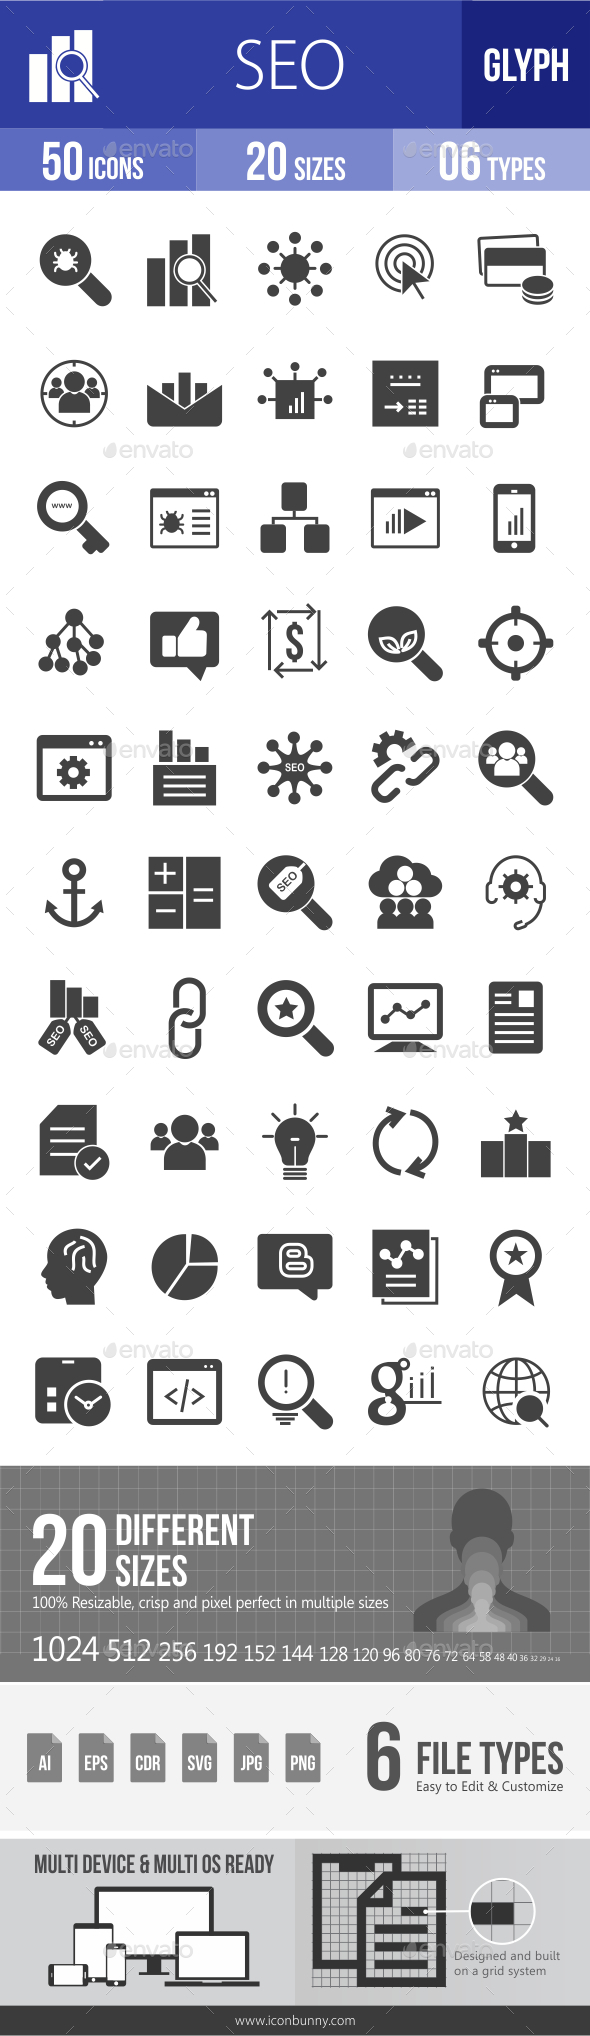 SEO Glyph Icons - Icons